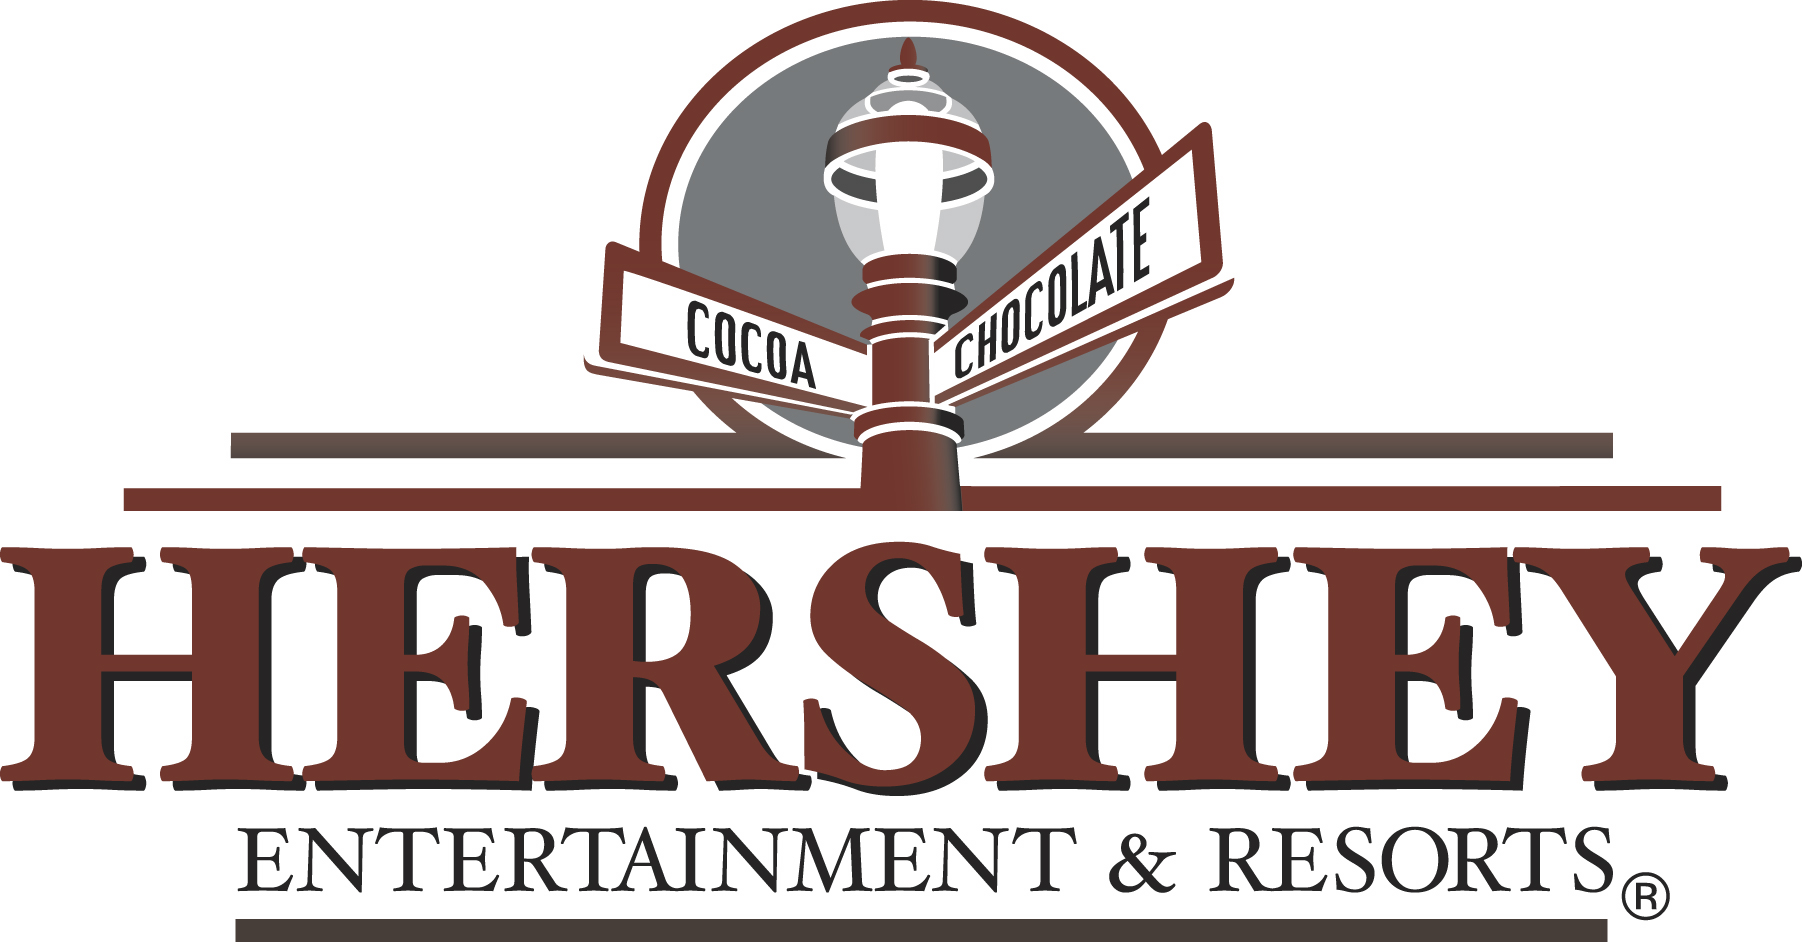 Copy of Hershey_Corporate_color.jpg